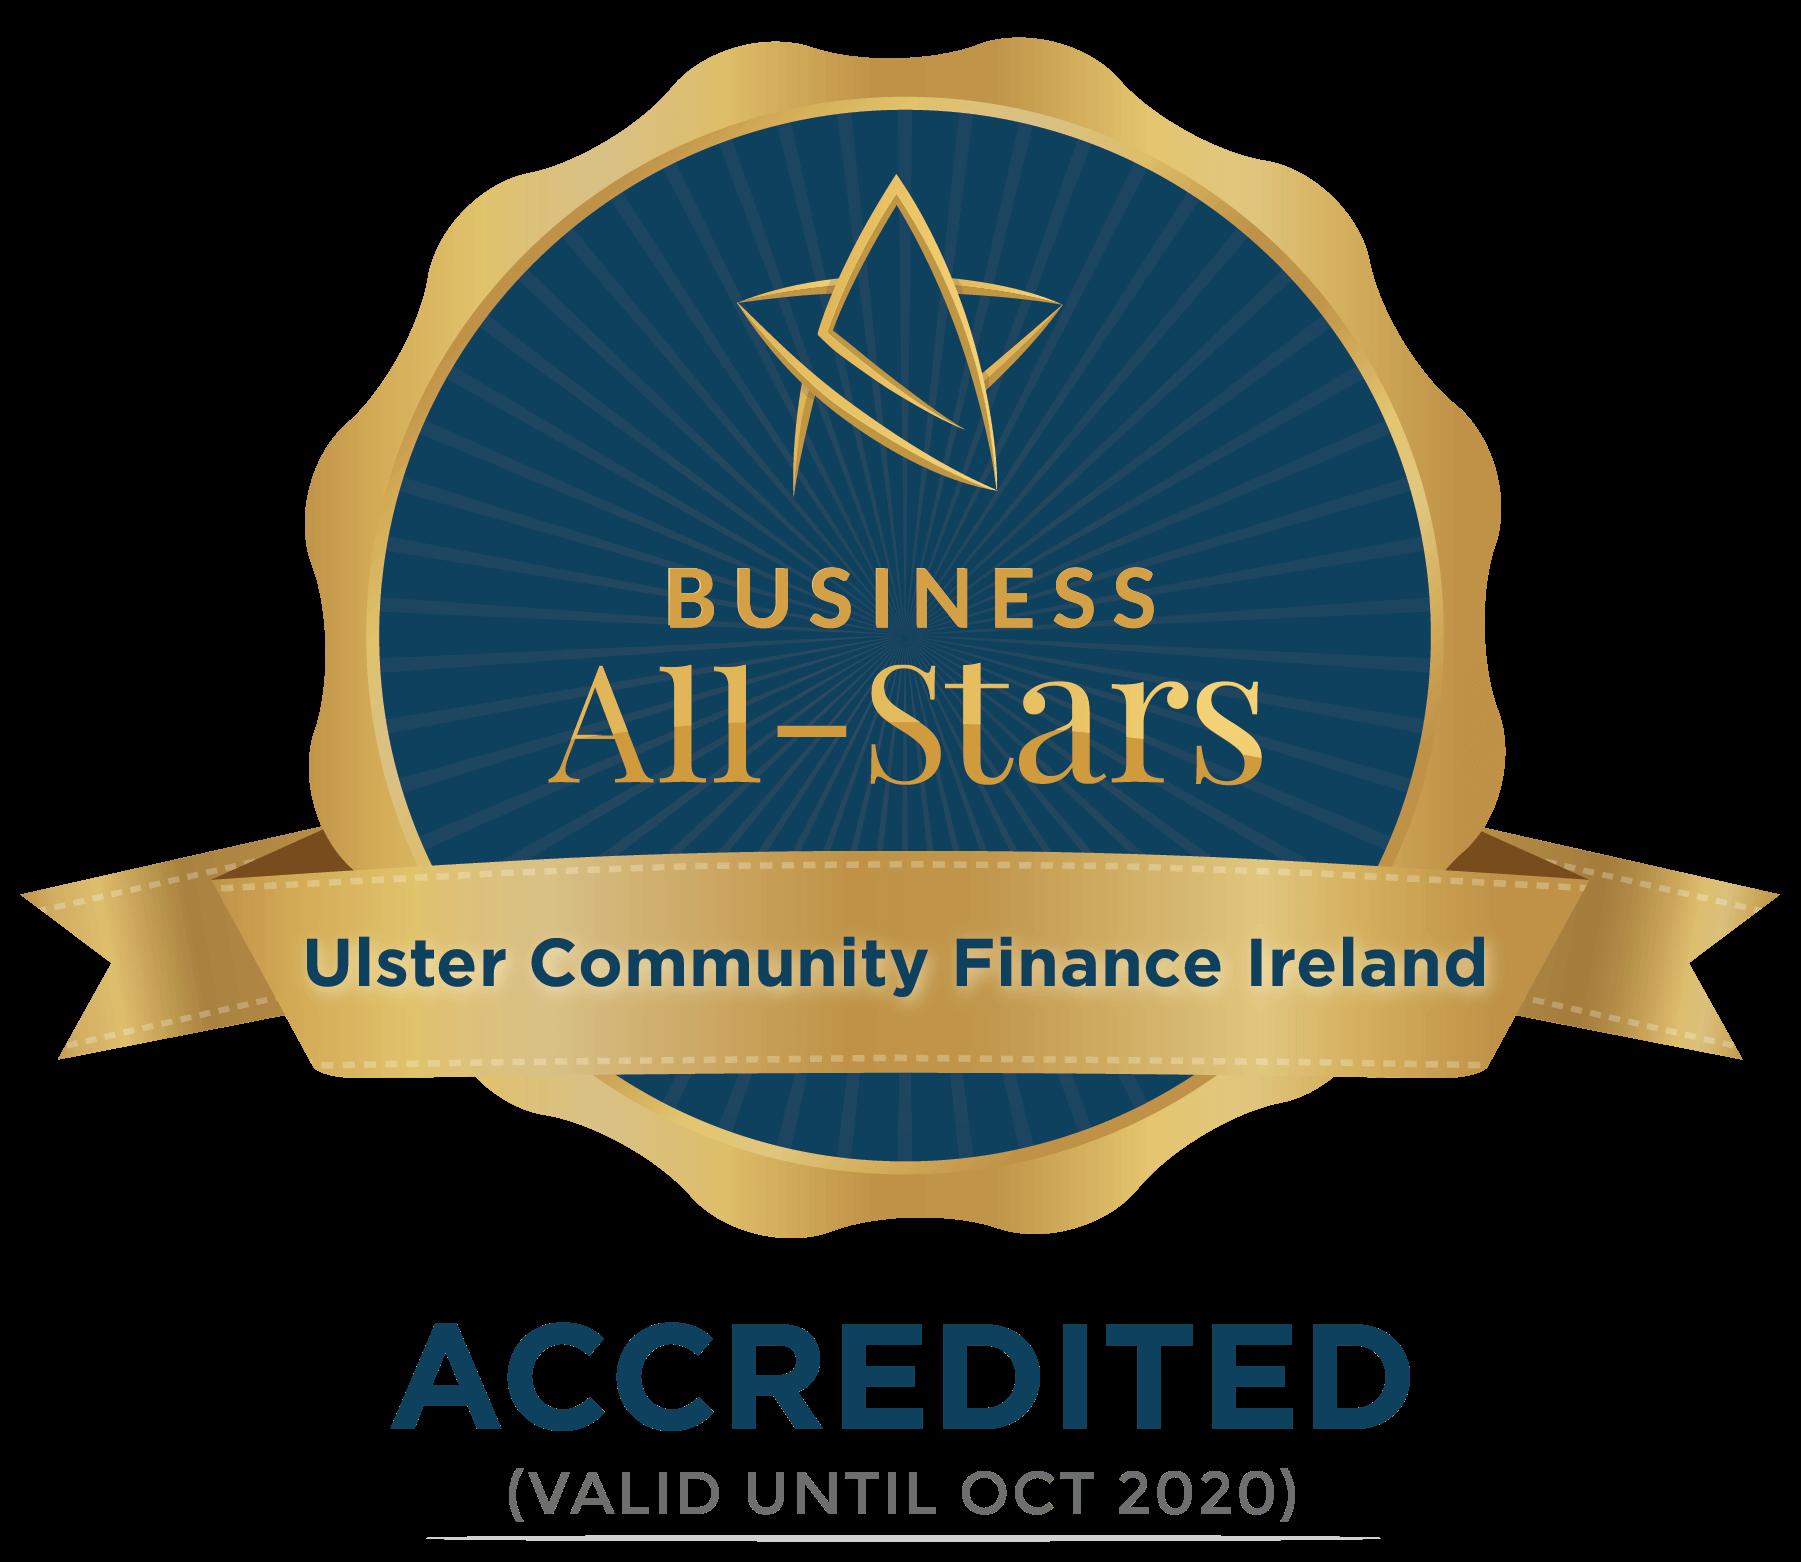 Community Finance Ireland  - Business All-Stars Accreditation